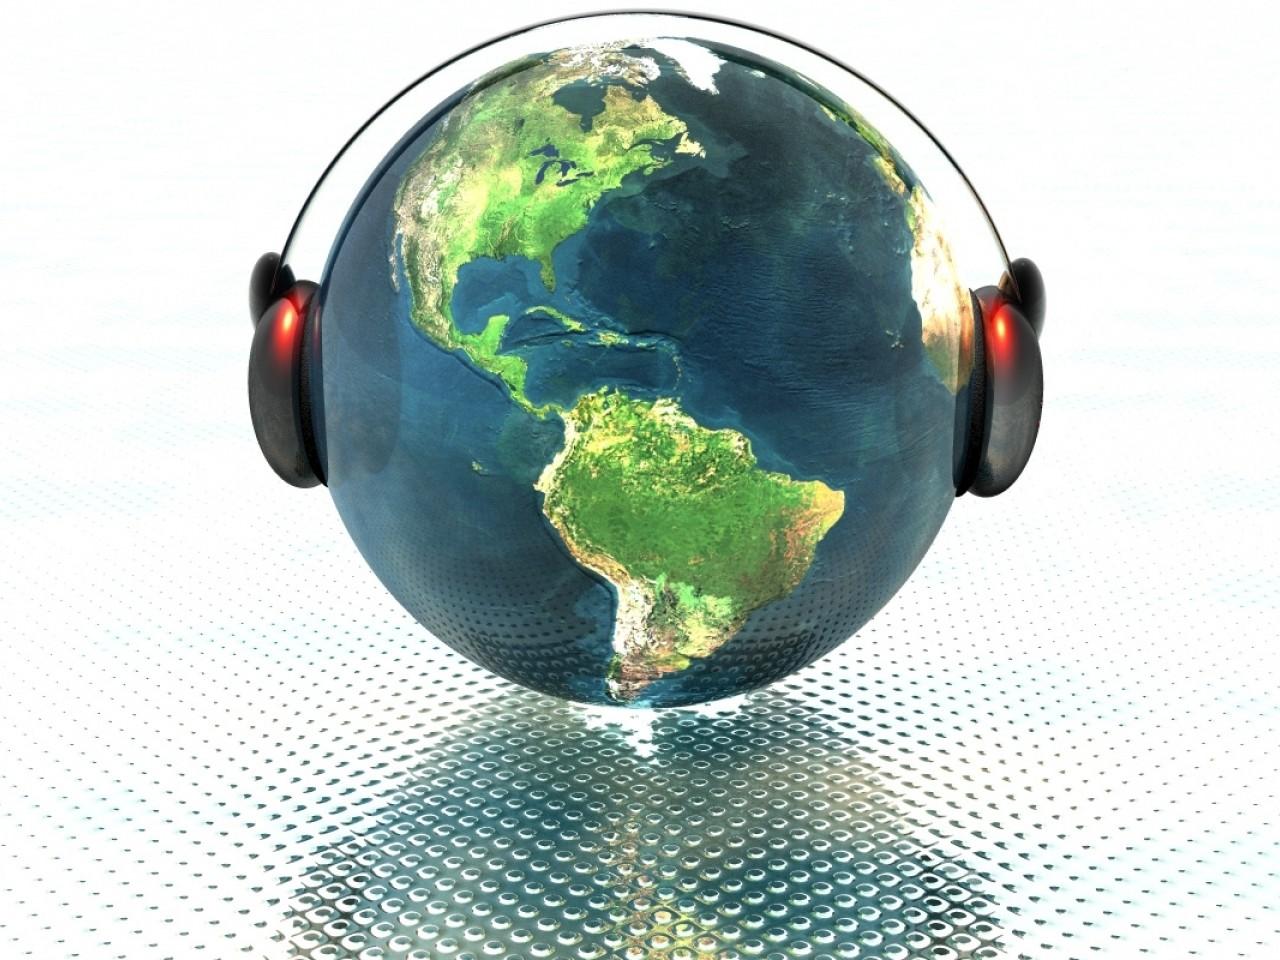 music-world-music-world-1280x9602